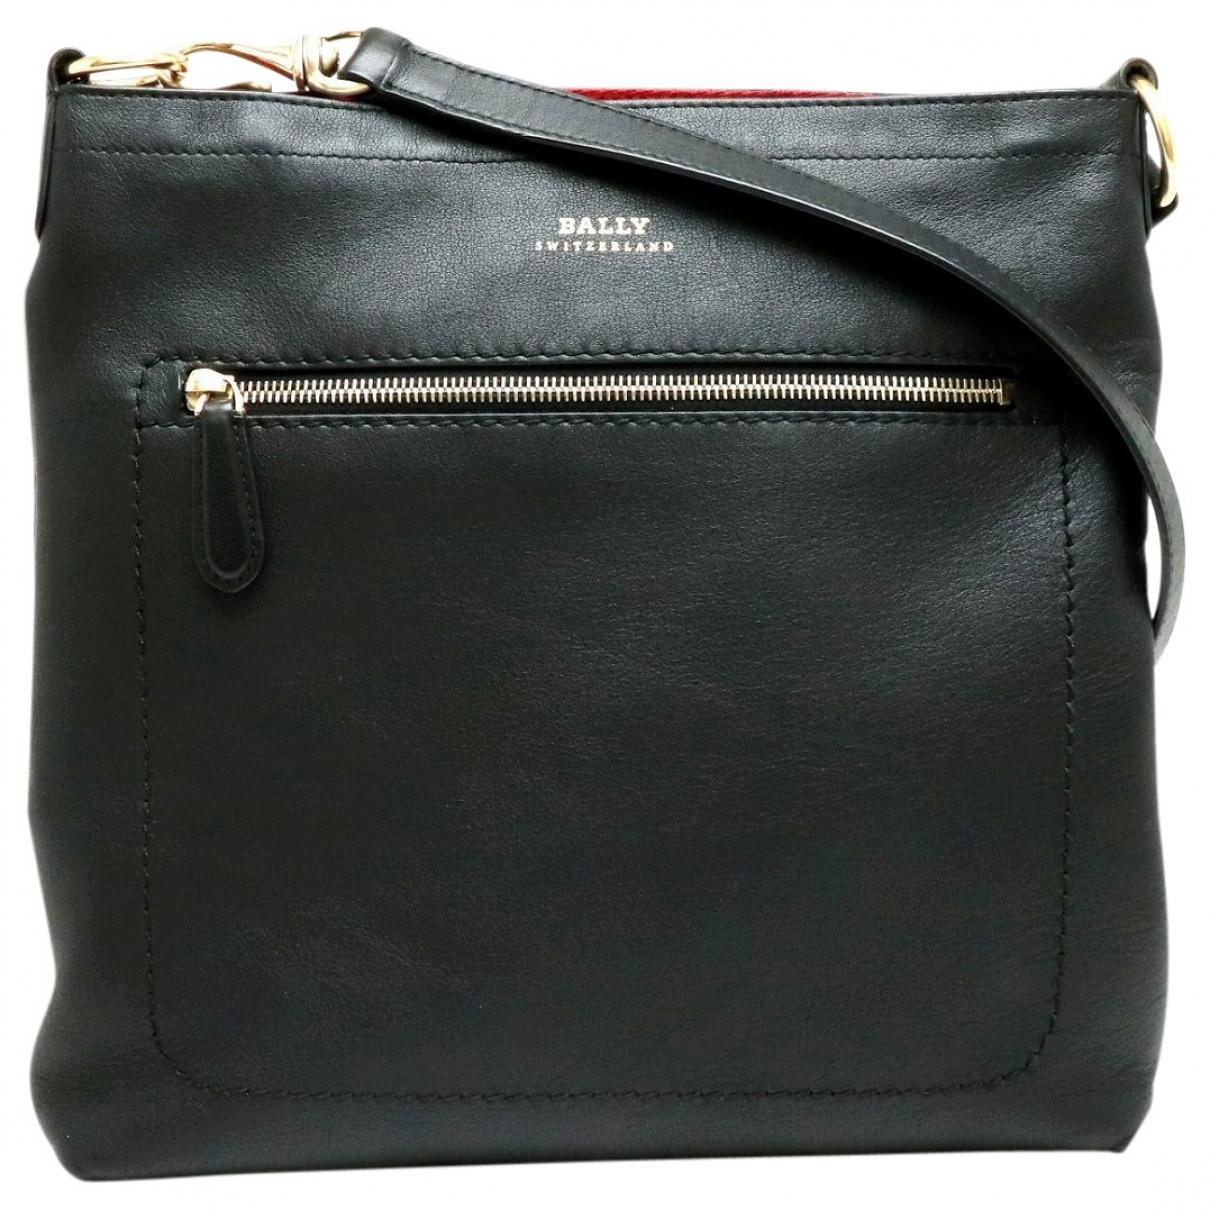 Bally \N Black Leather handbag for Women \N